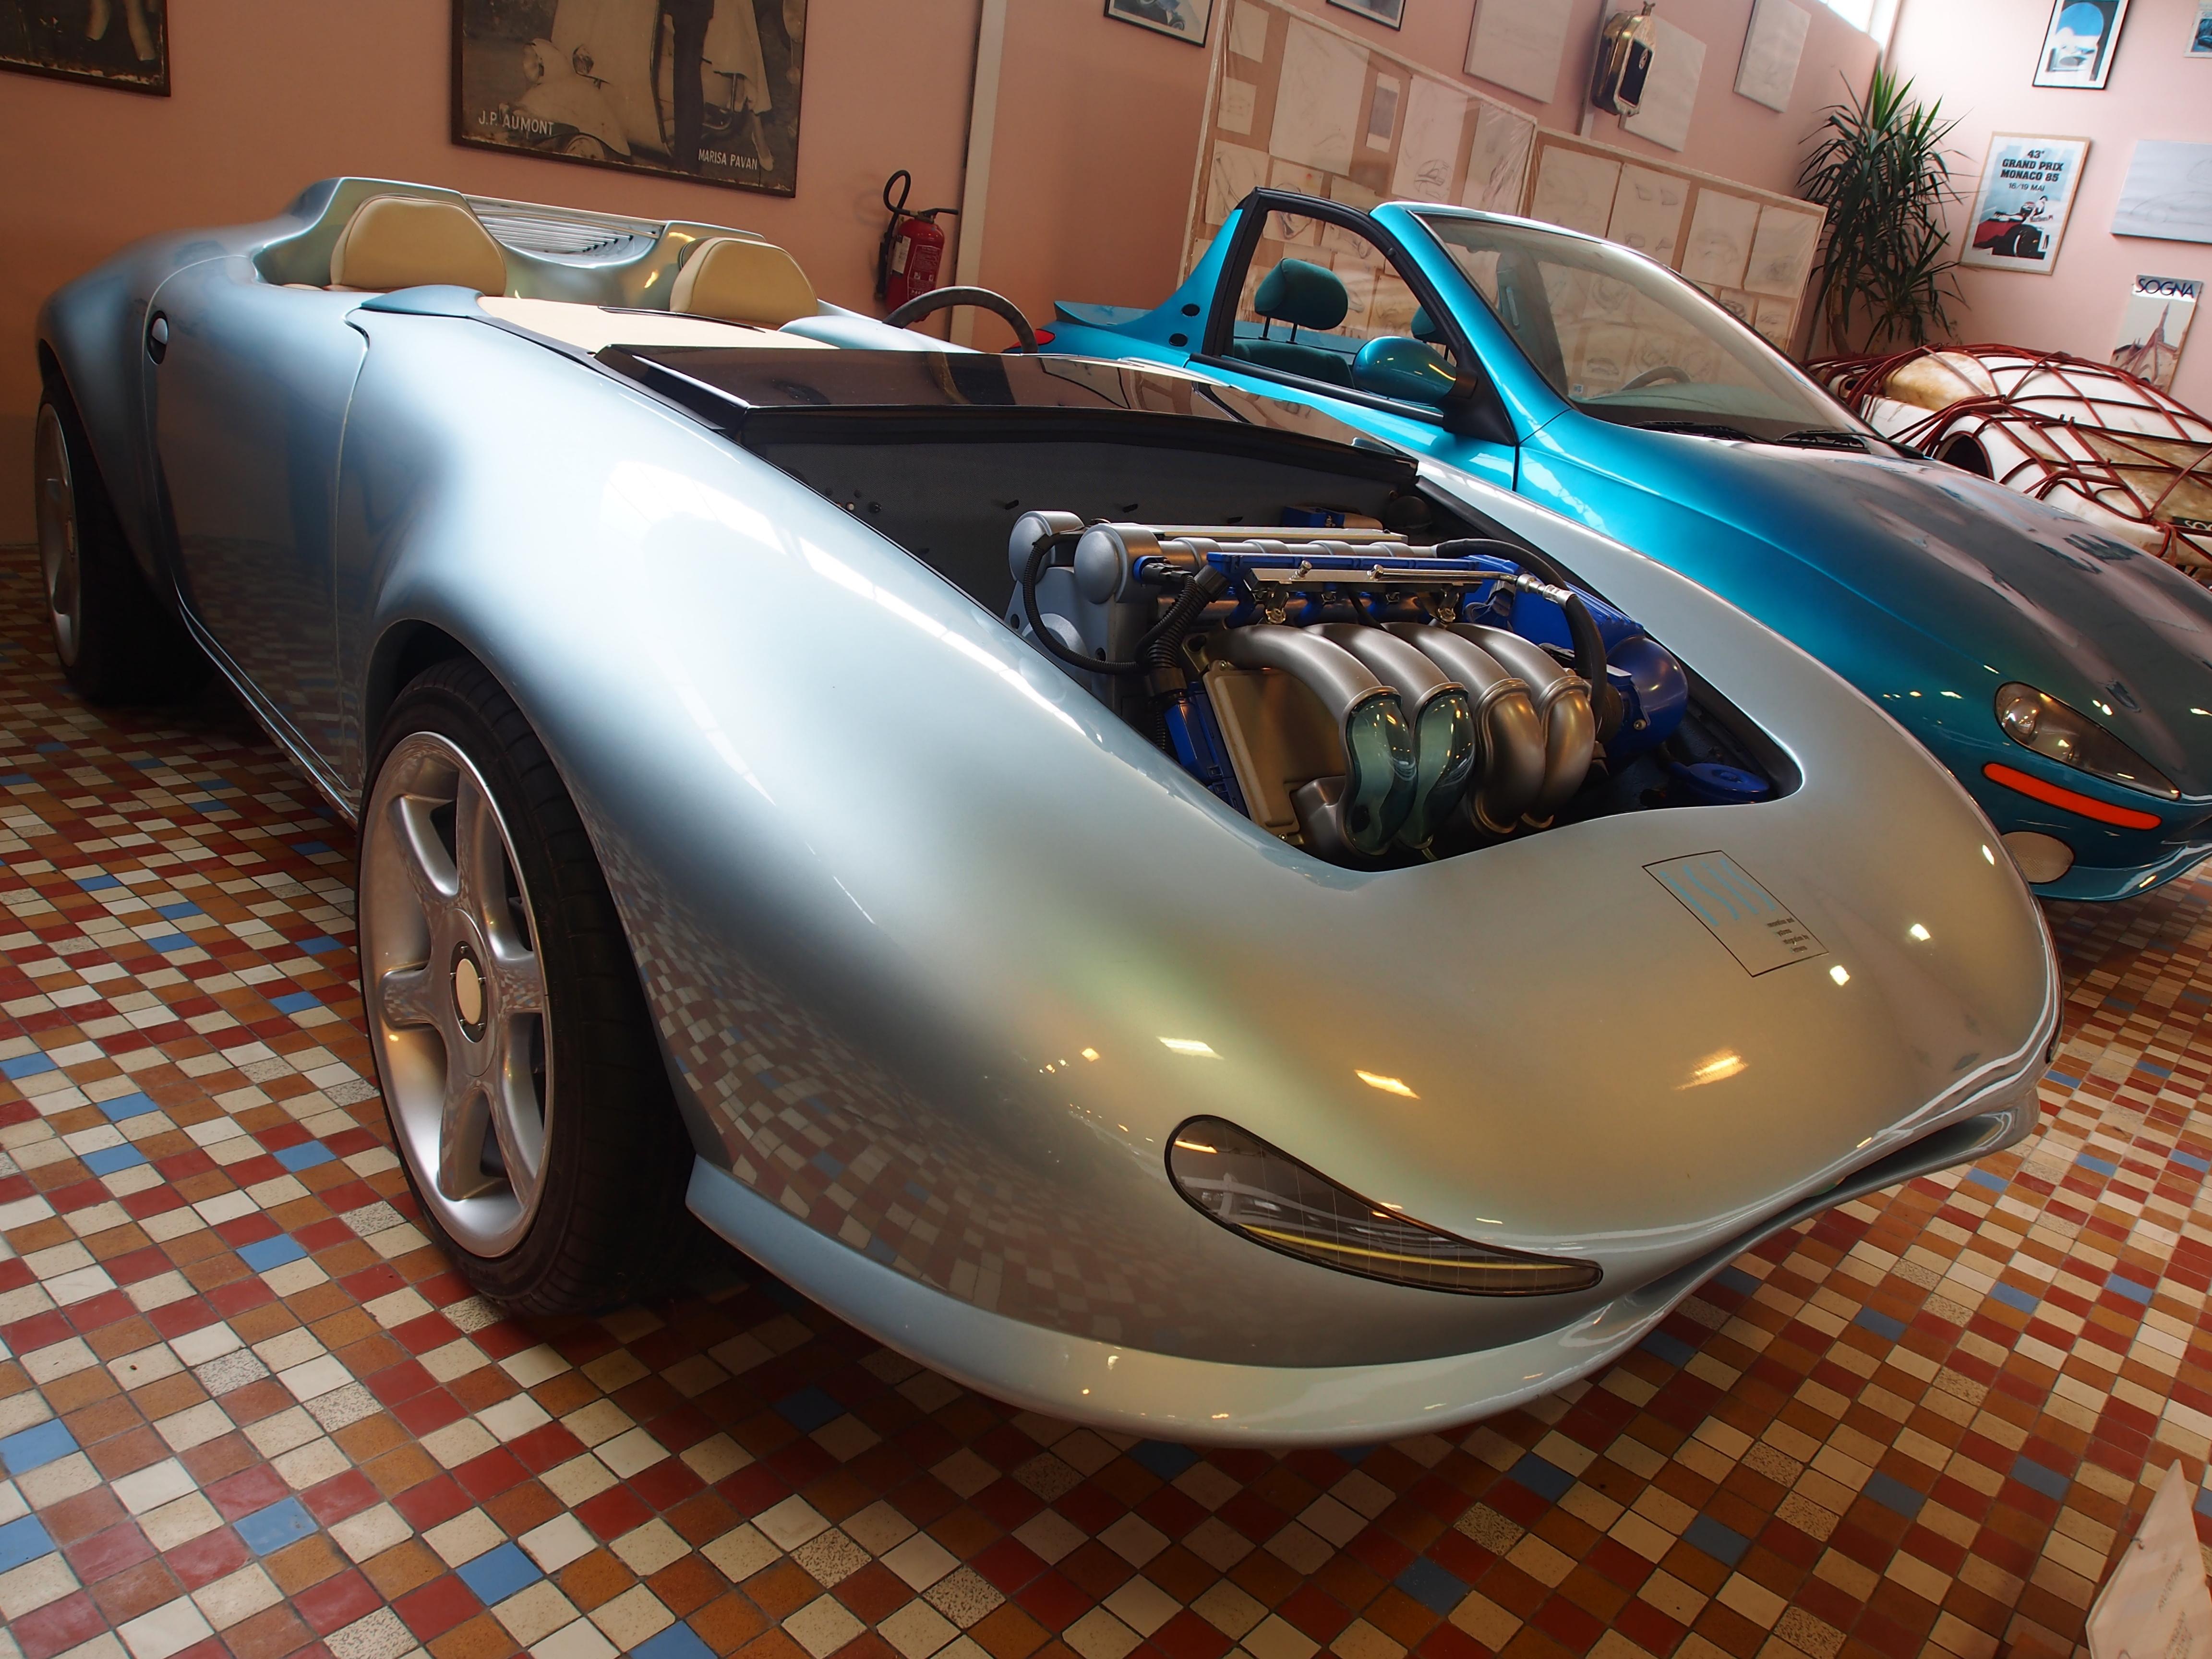 file 1997 patrice dion siemens isis concept car at the mus e automobile de vend e pic 4 jpg. Black Bedroom Furniture Sets. Home Design Ideas